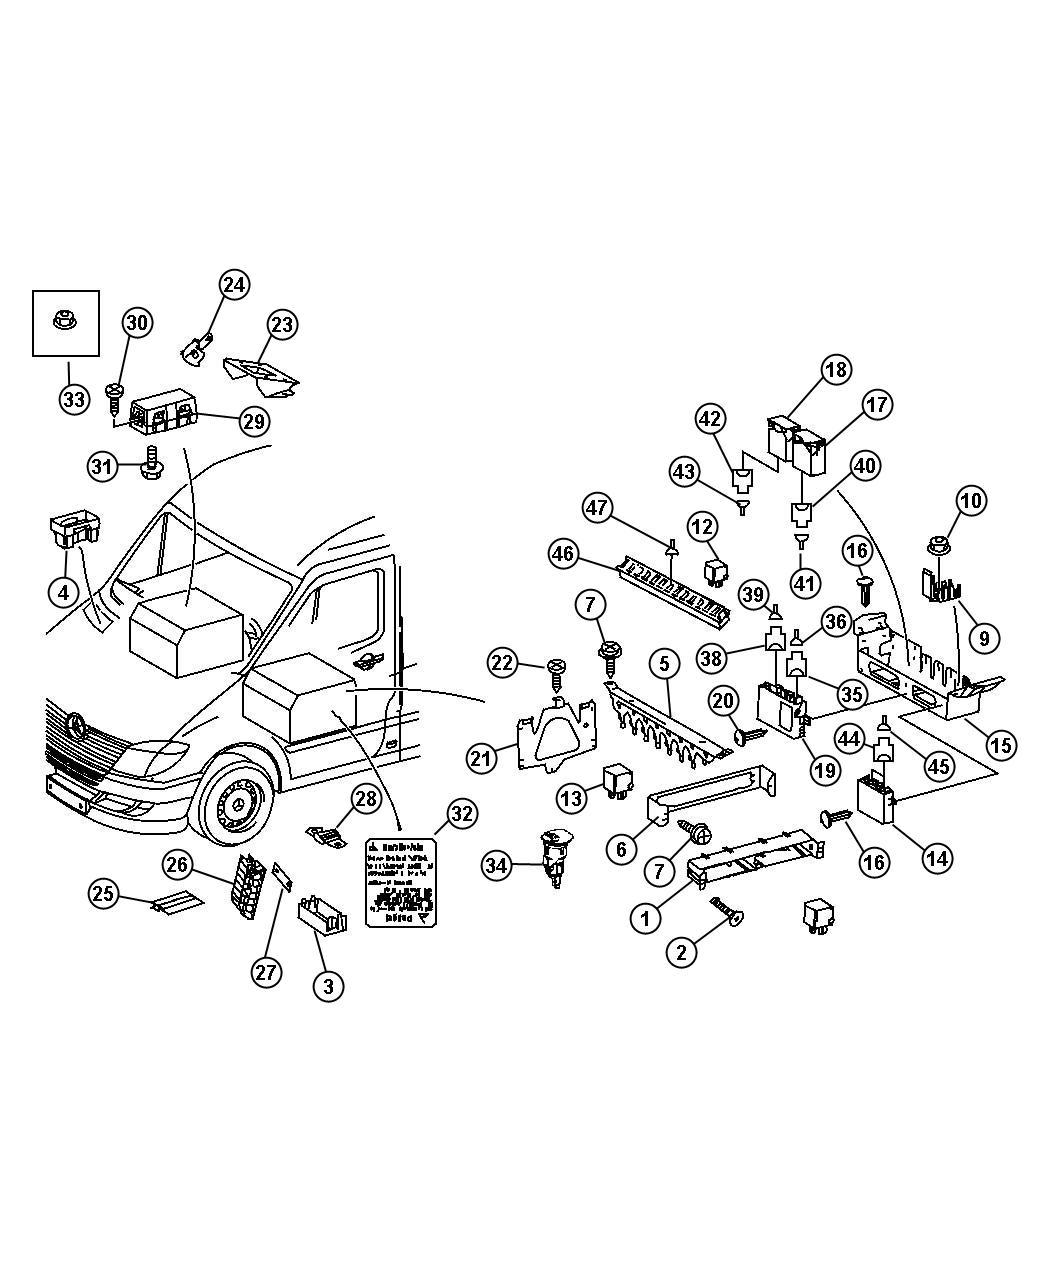 2000 jeep cherokee sport 4.0 fuel filter location